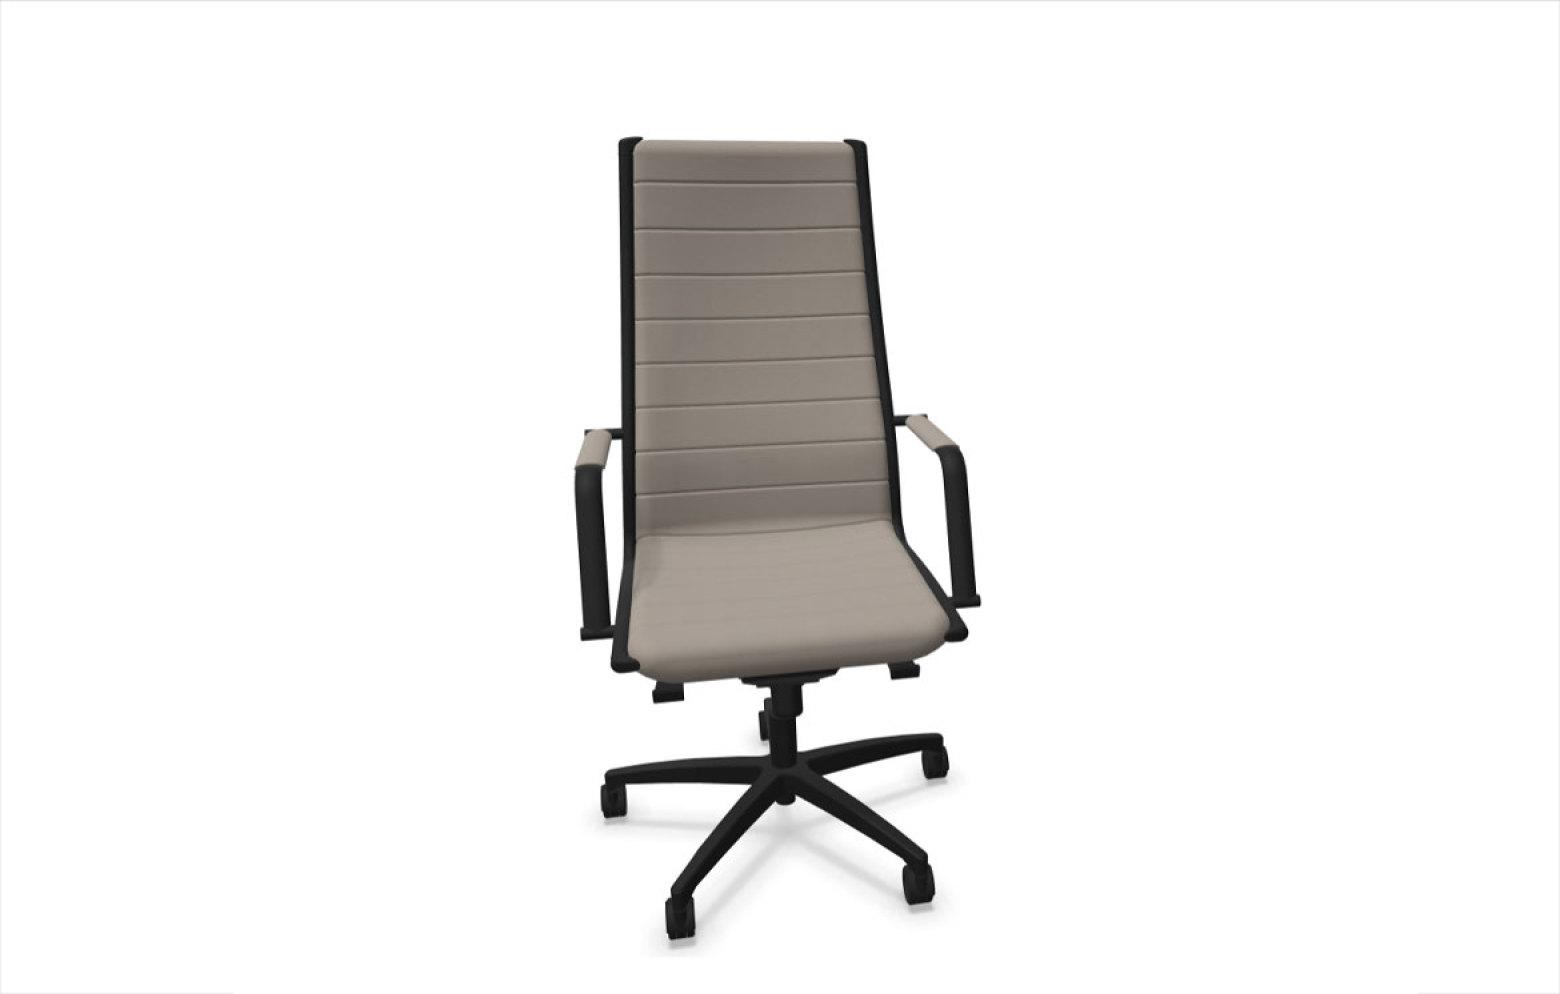 VEGA L Executive | Bürostühle | Büromöbel | Who\'s perfect.